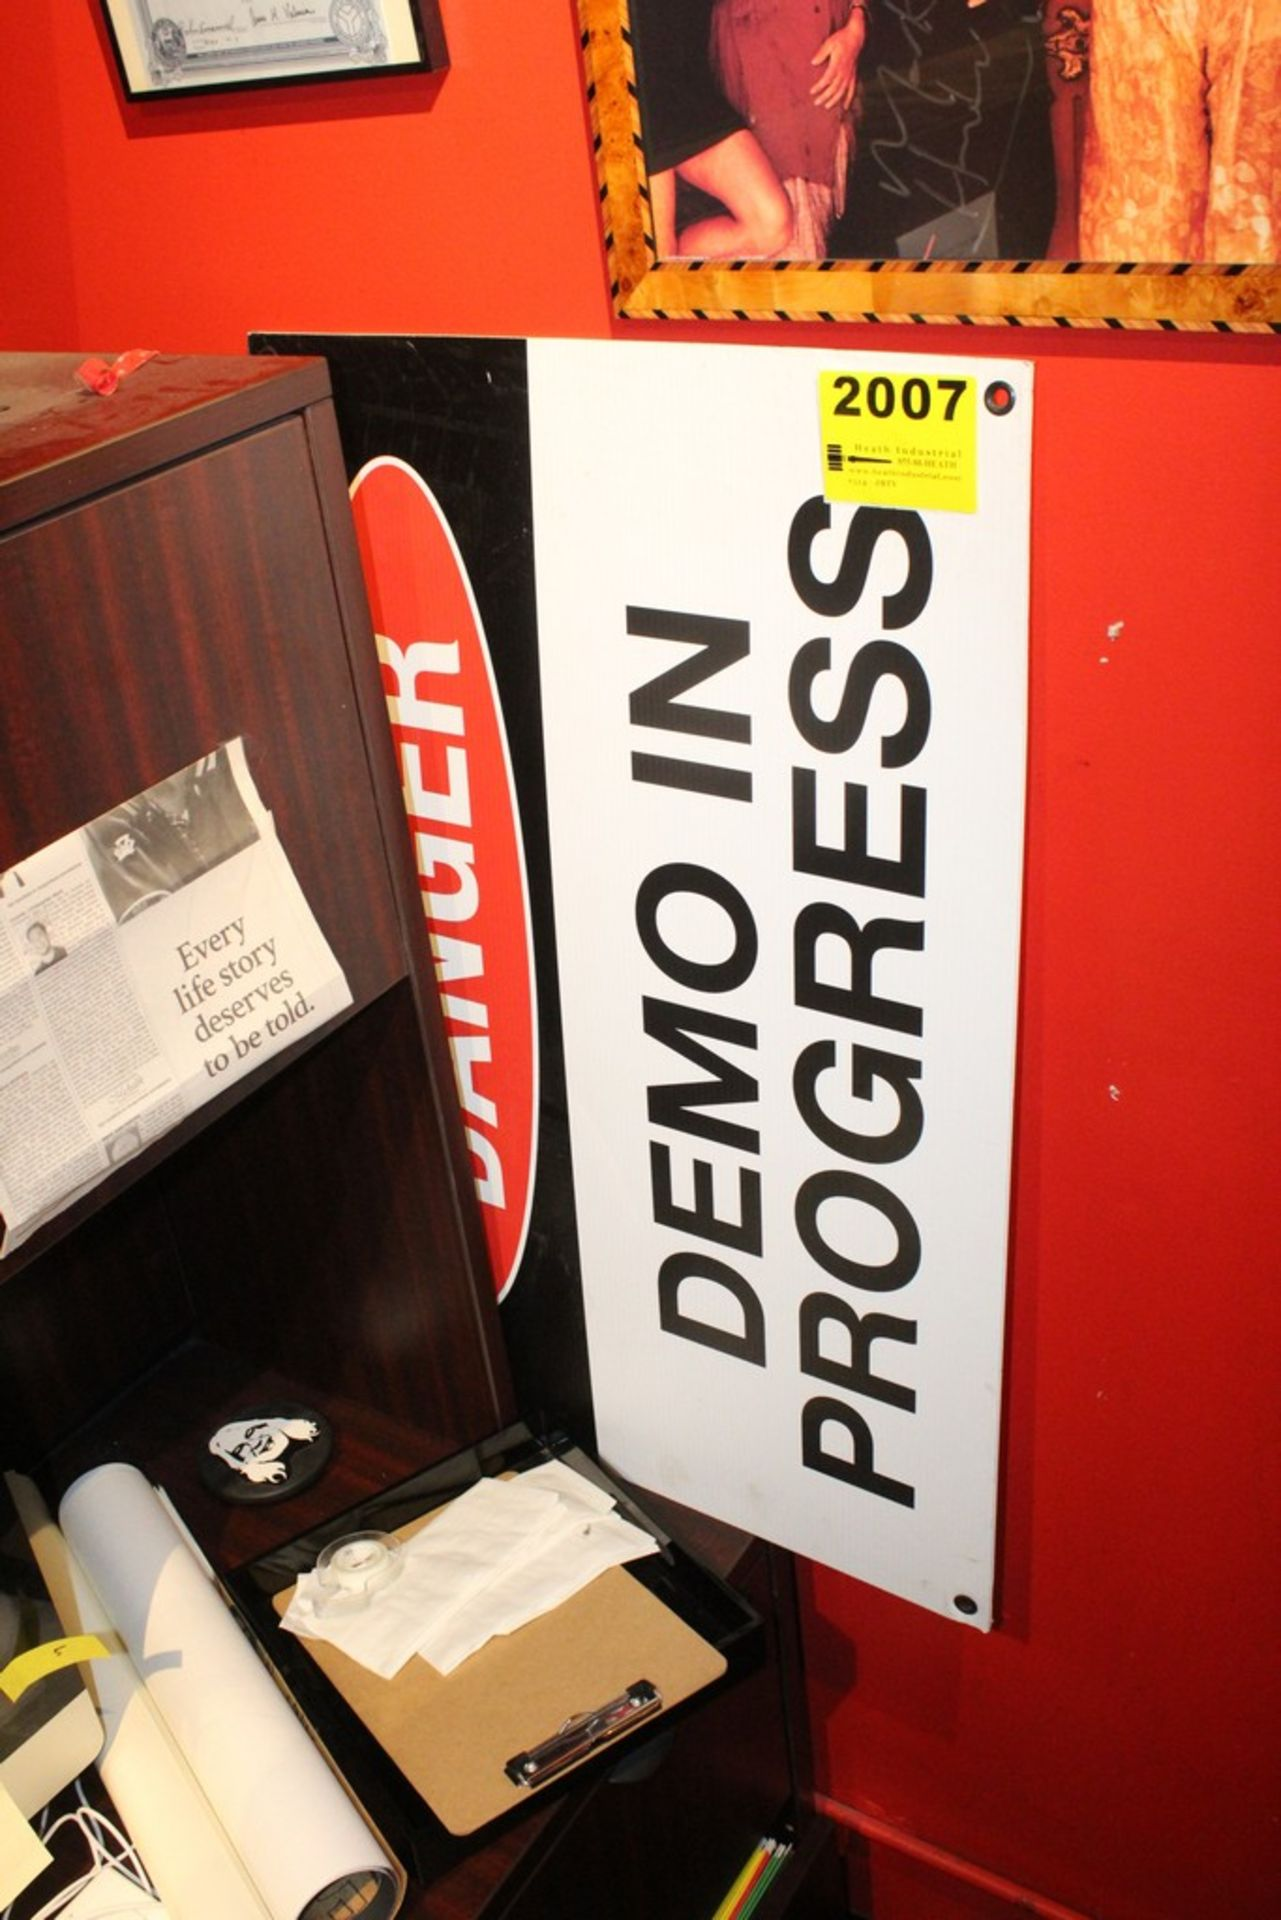 Lot 2007 - Danger Demo in Progress Sign